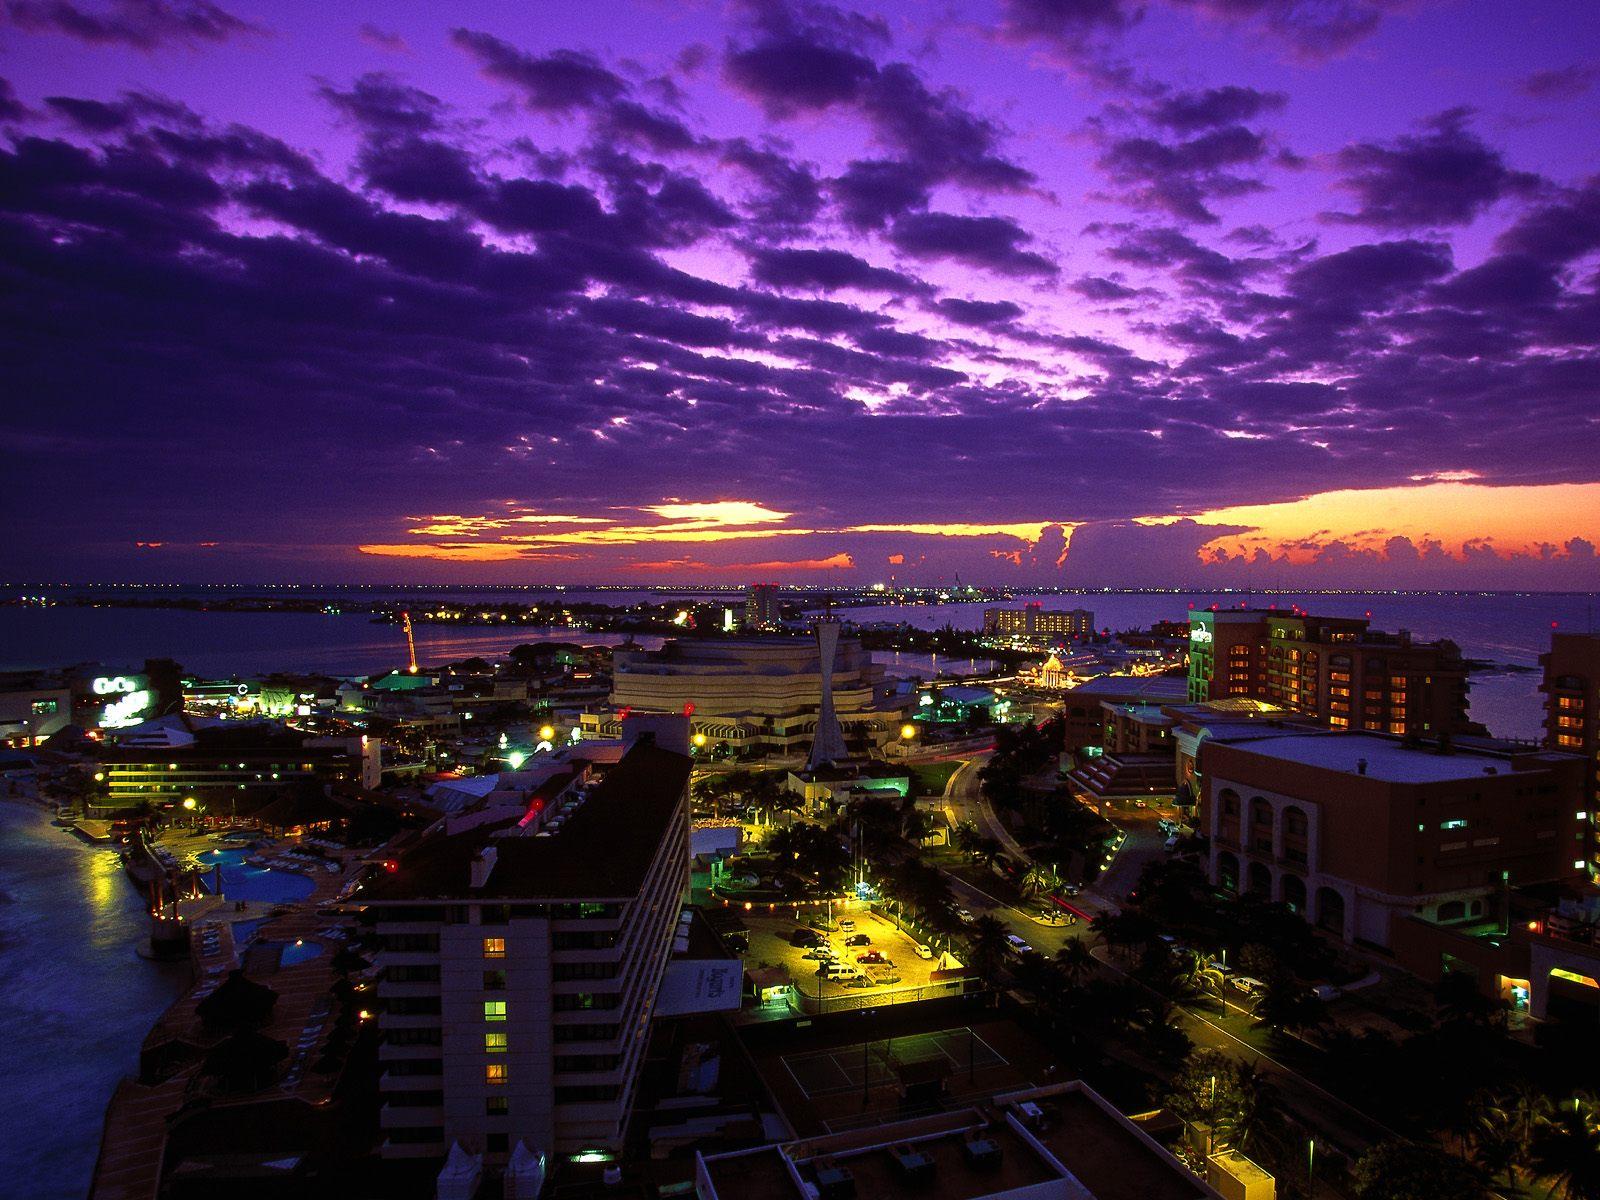 020 - Cancun - Mexico